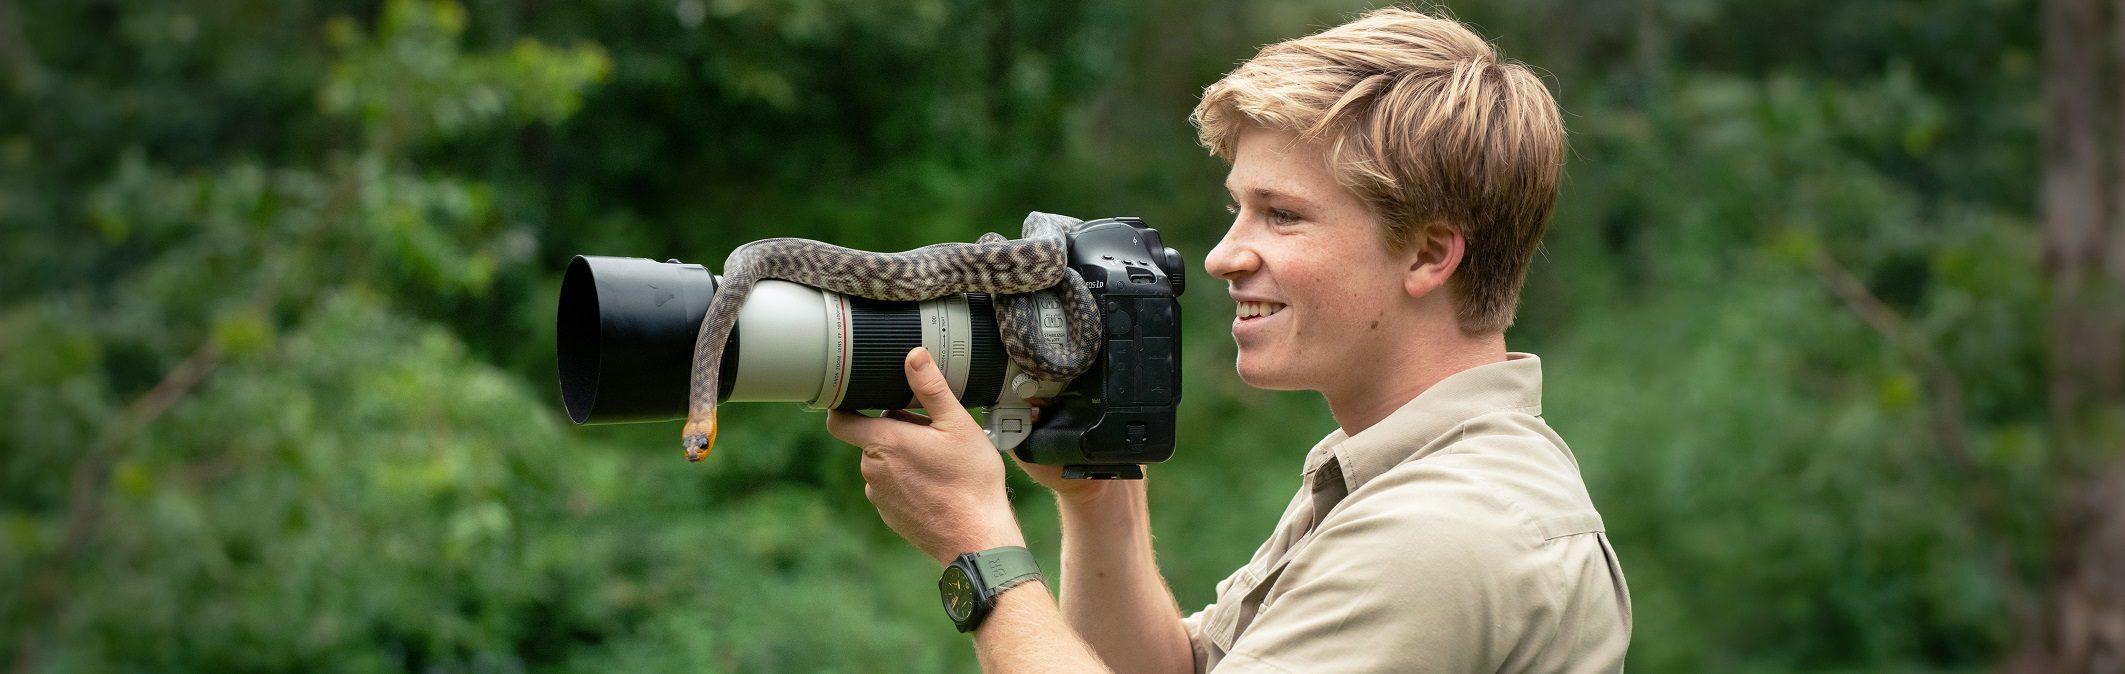 Robert Irwin Photo competition